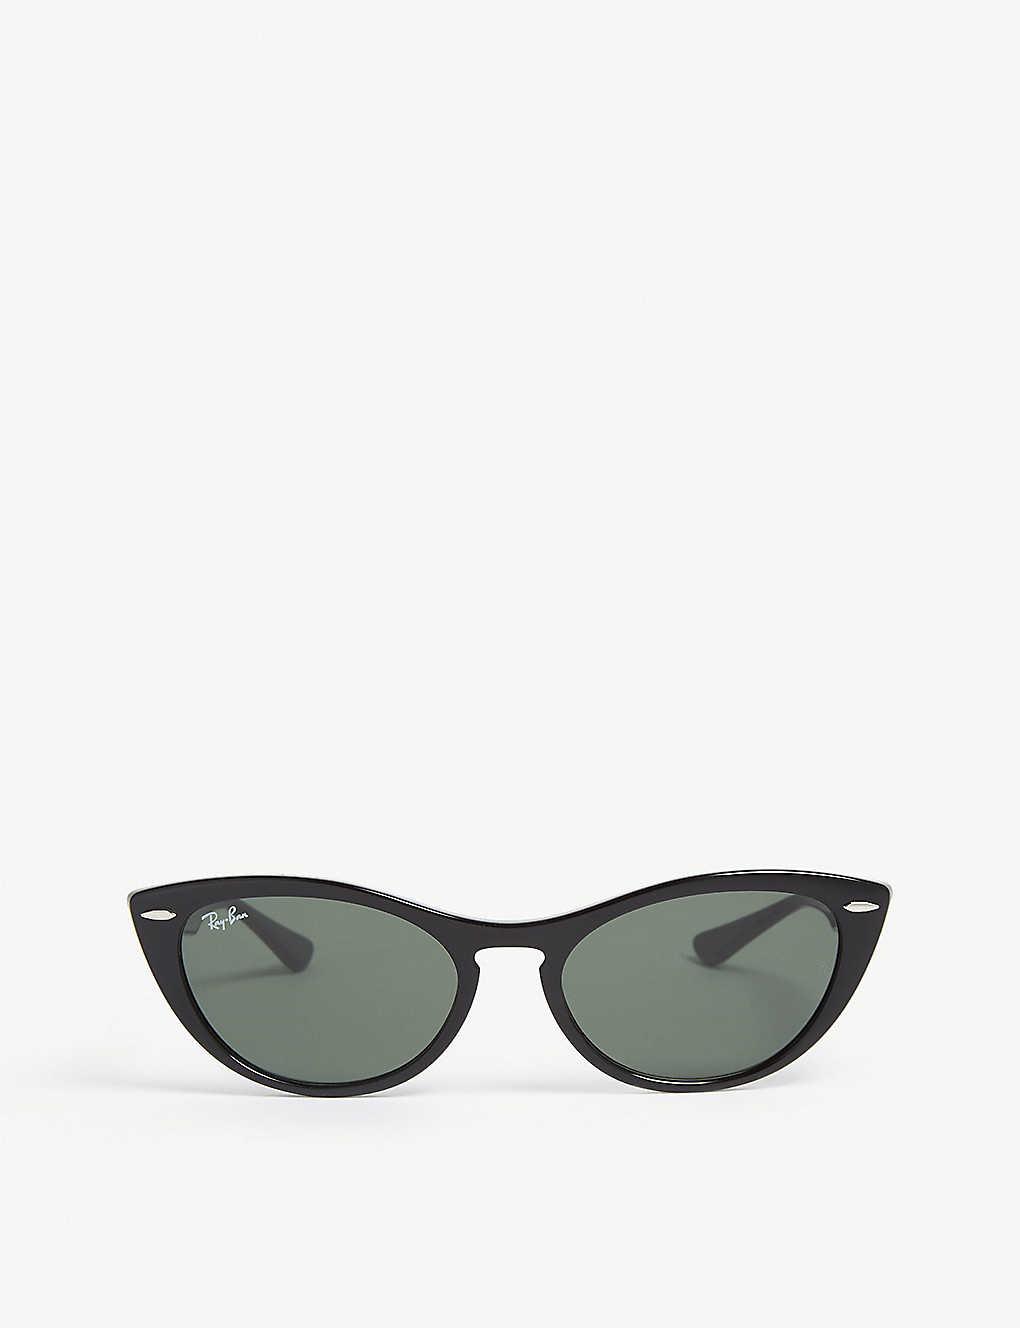 d091ef70cdaa52 RAY-BAN - RB4314 Nina cat-eye-frame sunglasses